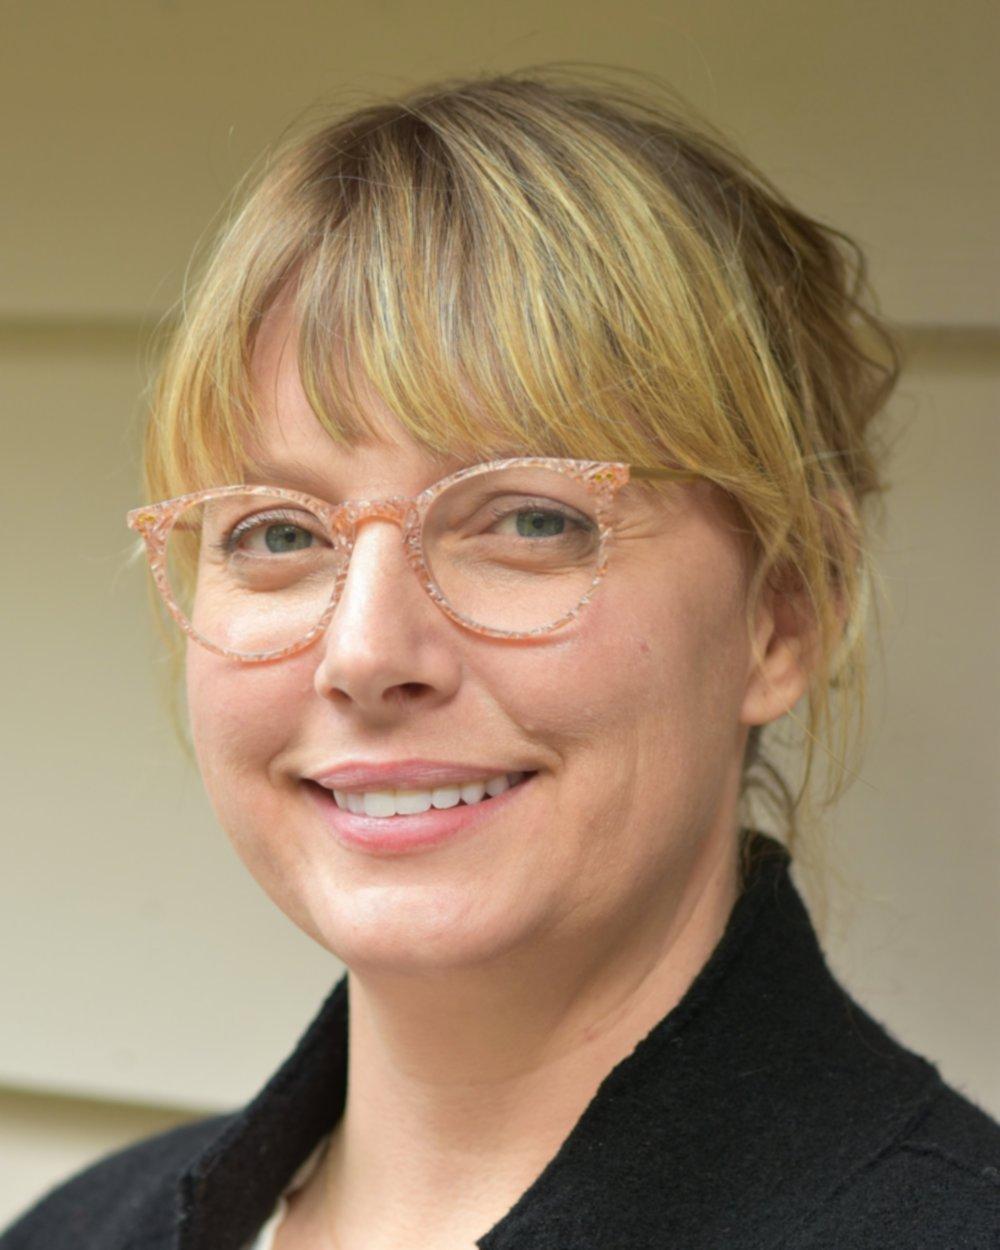 Lora Smith, Appalachian Impact Fund - lora[at]appalachianky.org